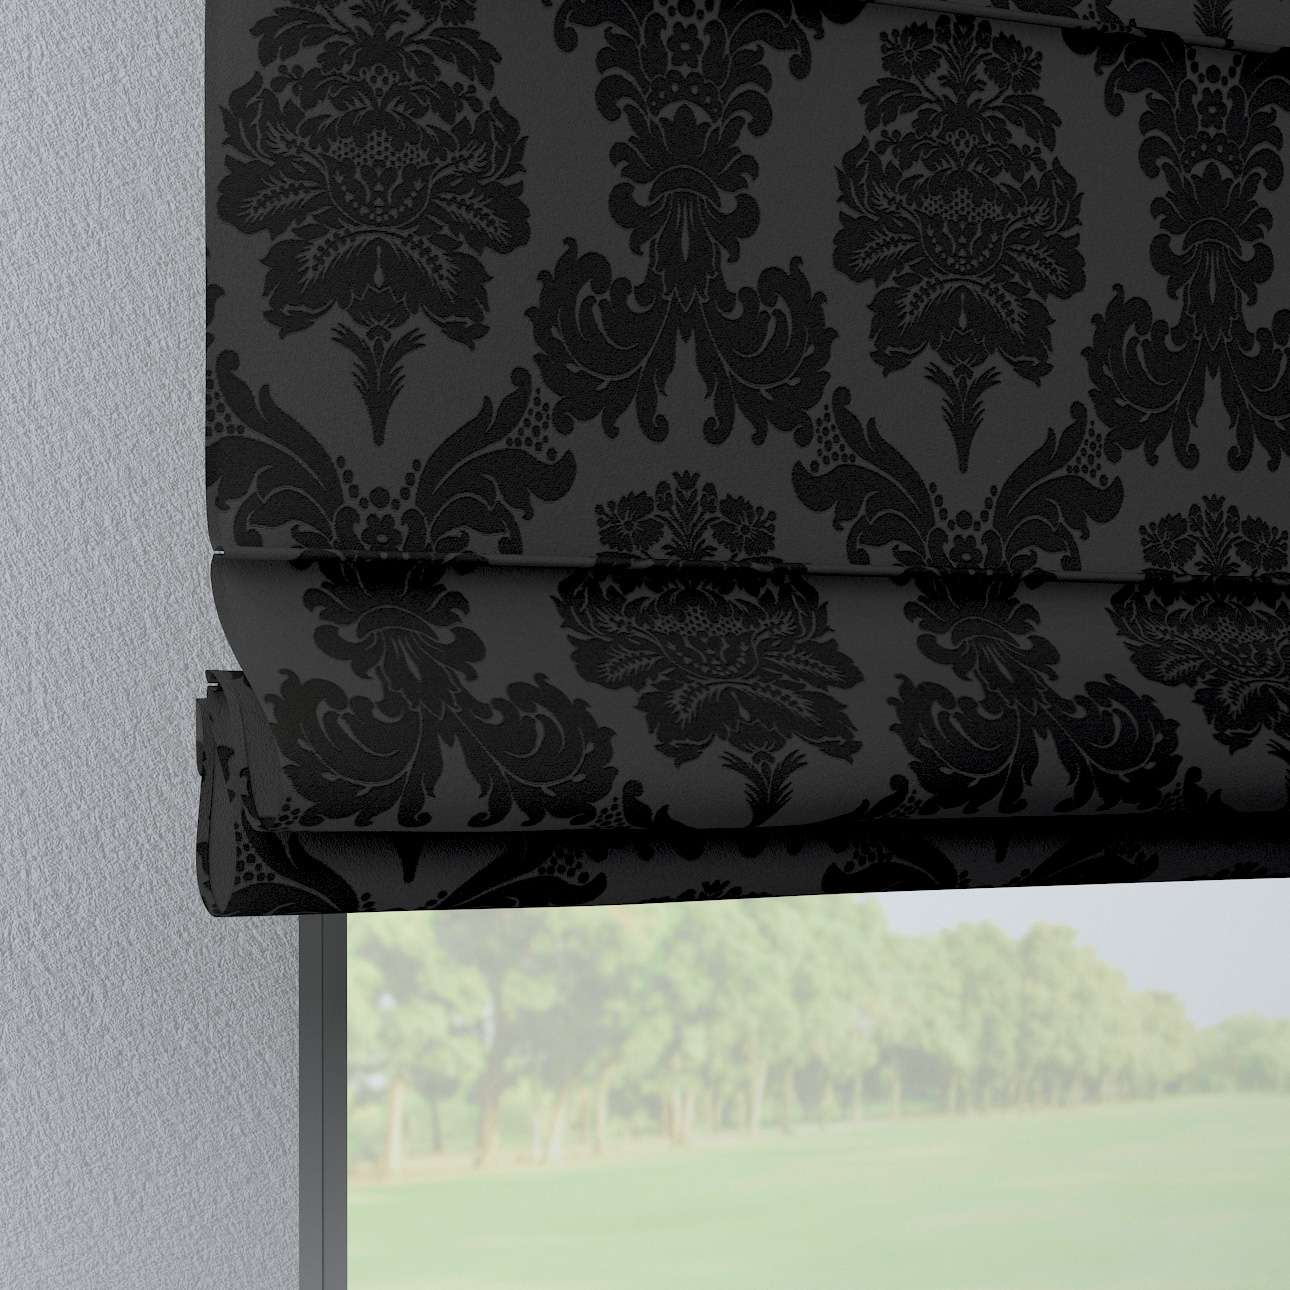 Foldegardin Verona<br/>Med stropper til gardinstang 80 × 170 cm fra kollektionen Damasco, Stof: 613-32